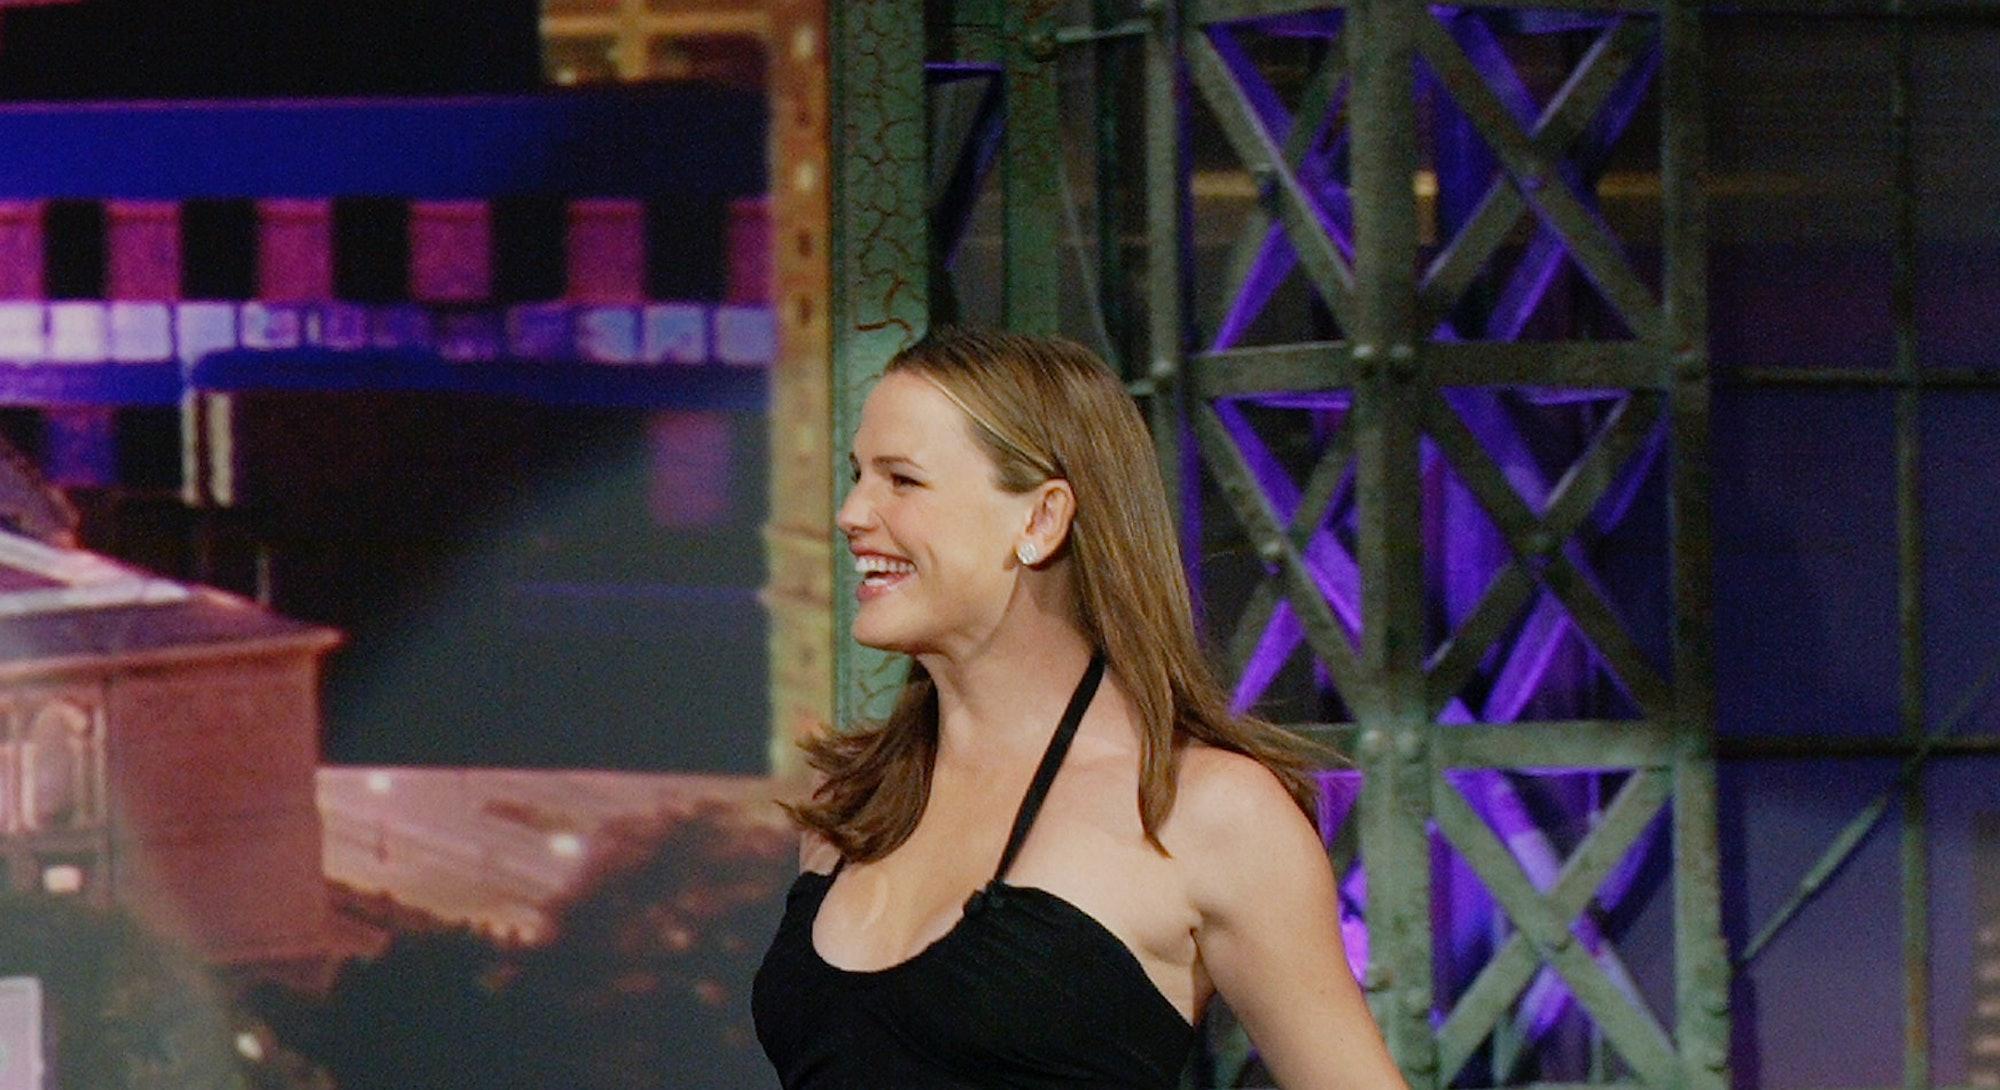 Jennifer Garner made a talkshow appearance in 2005 while pregnant.